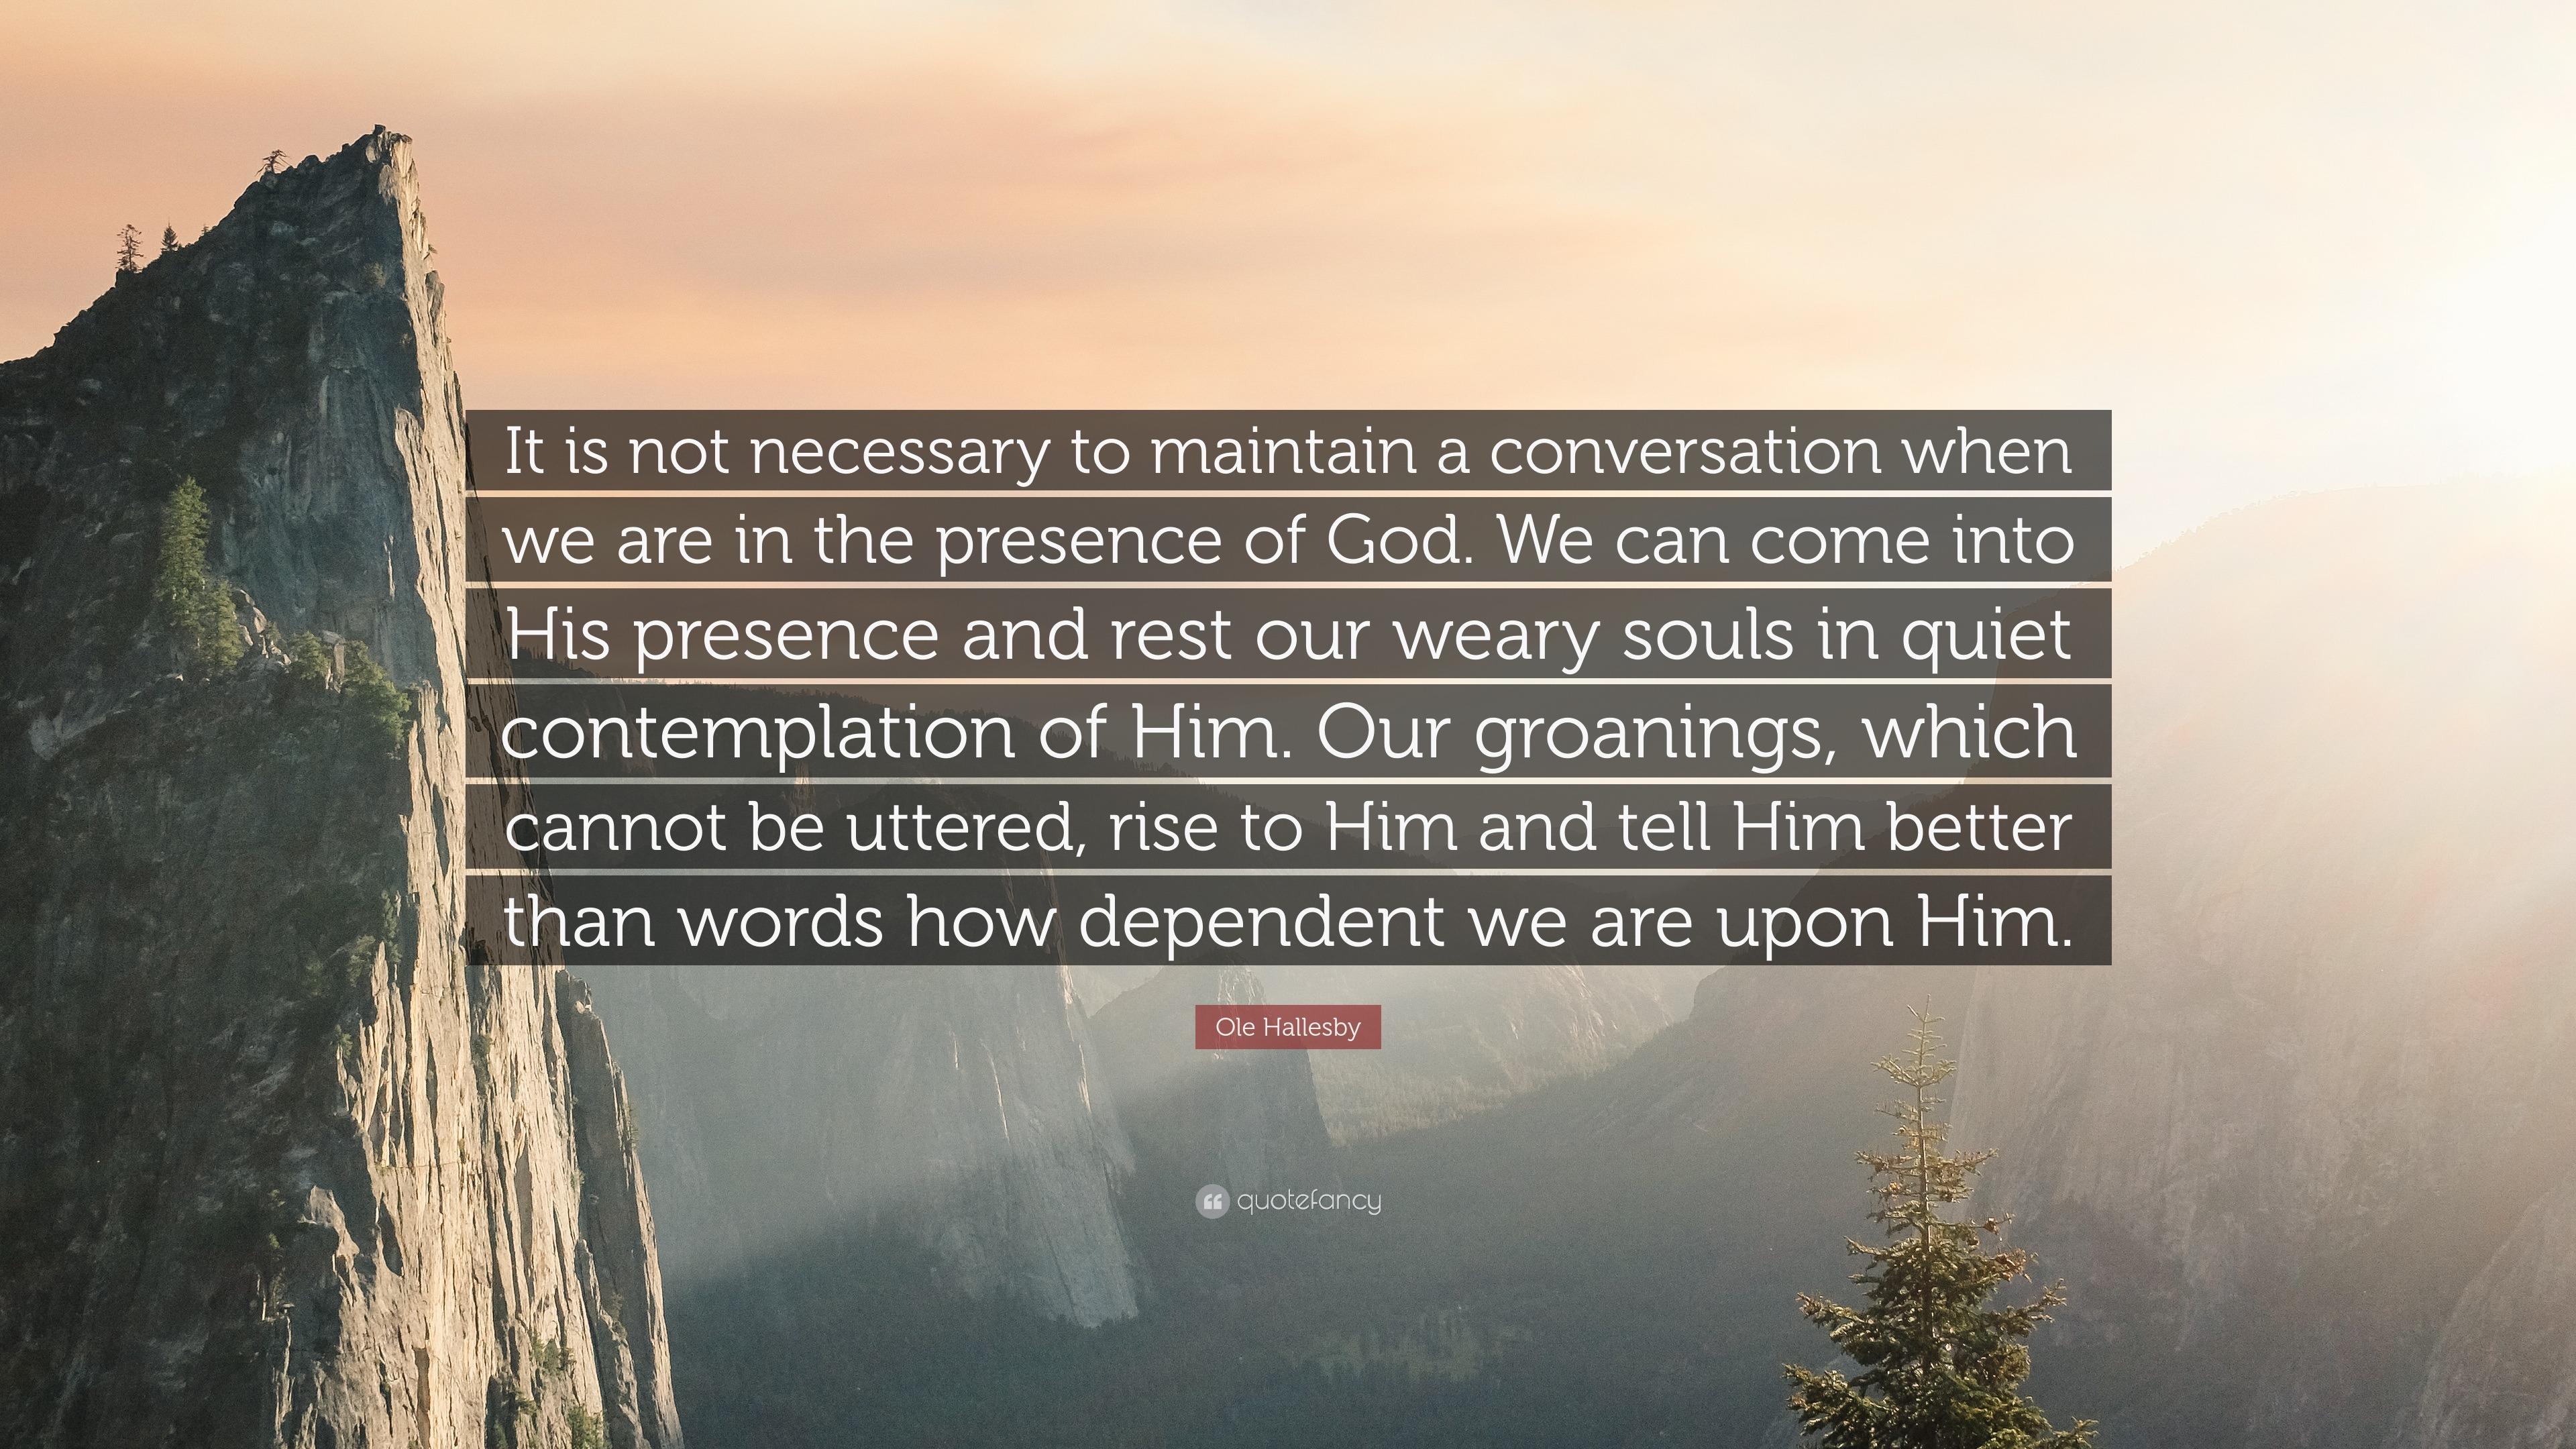 maintain a conversation